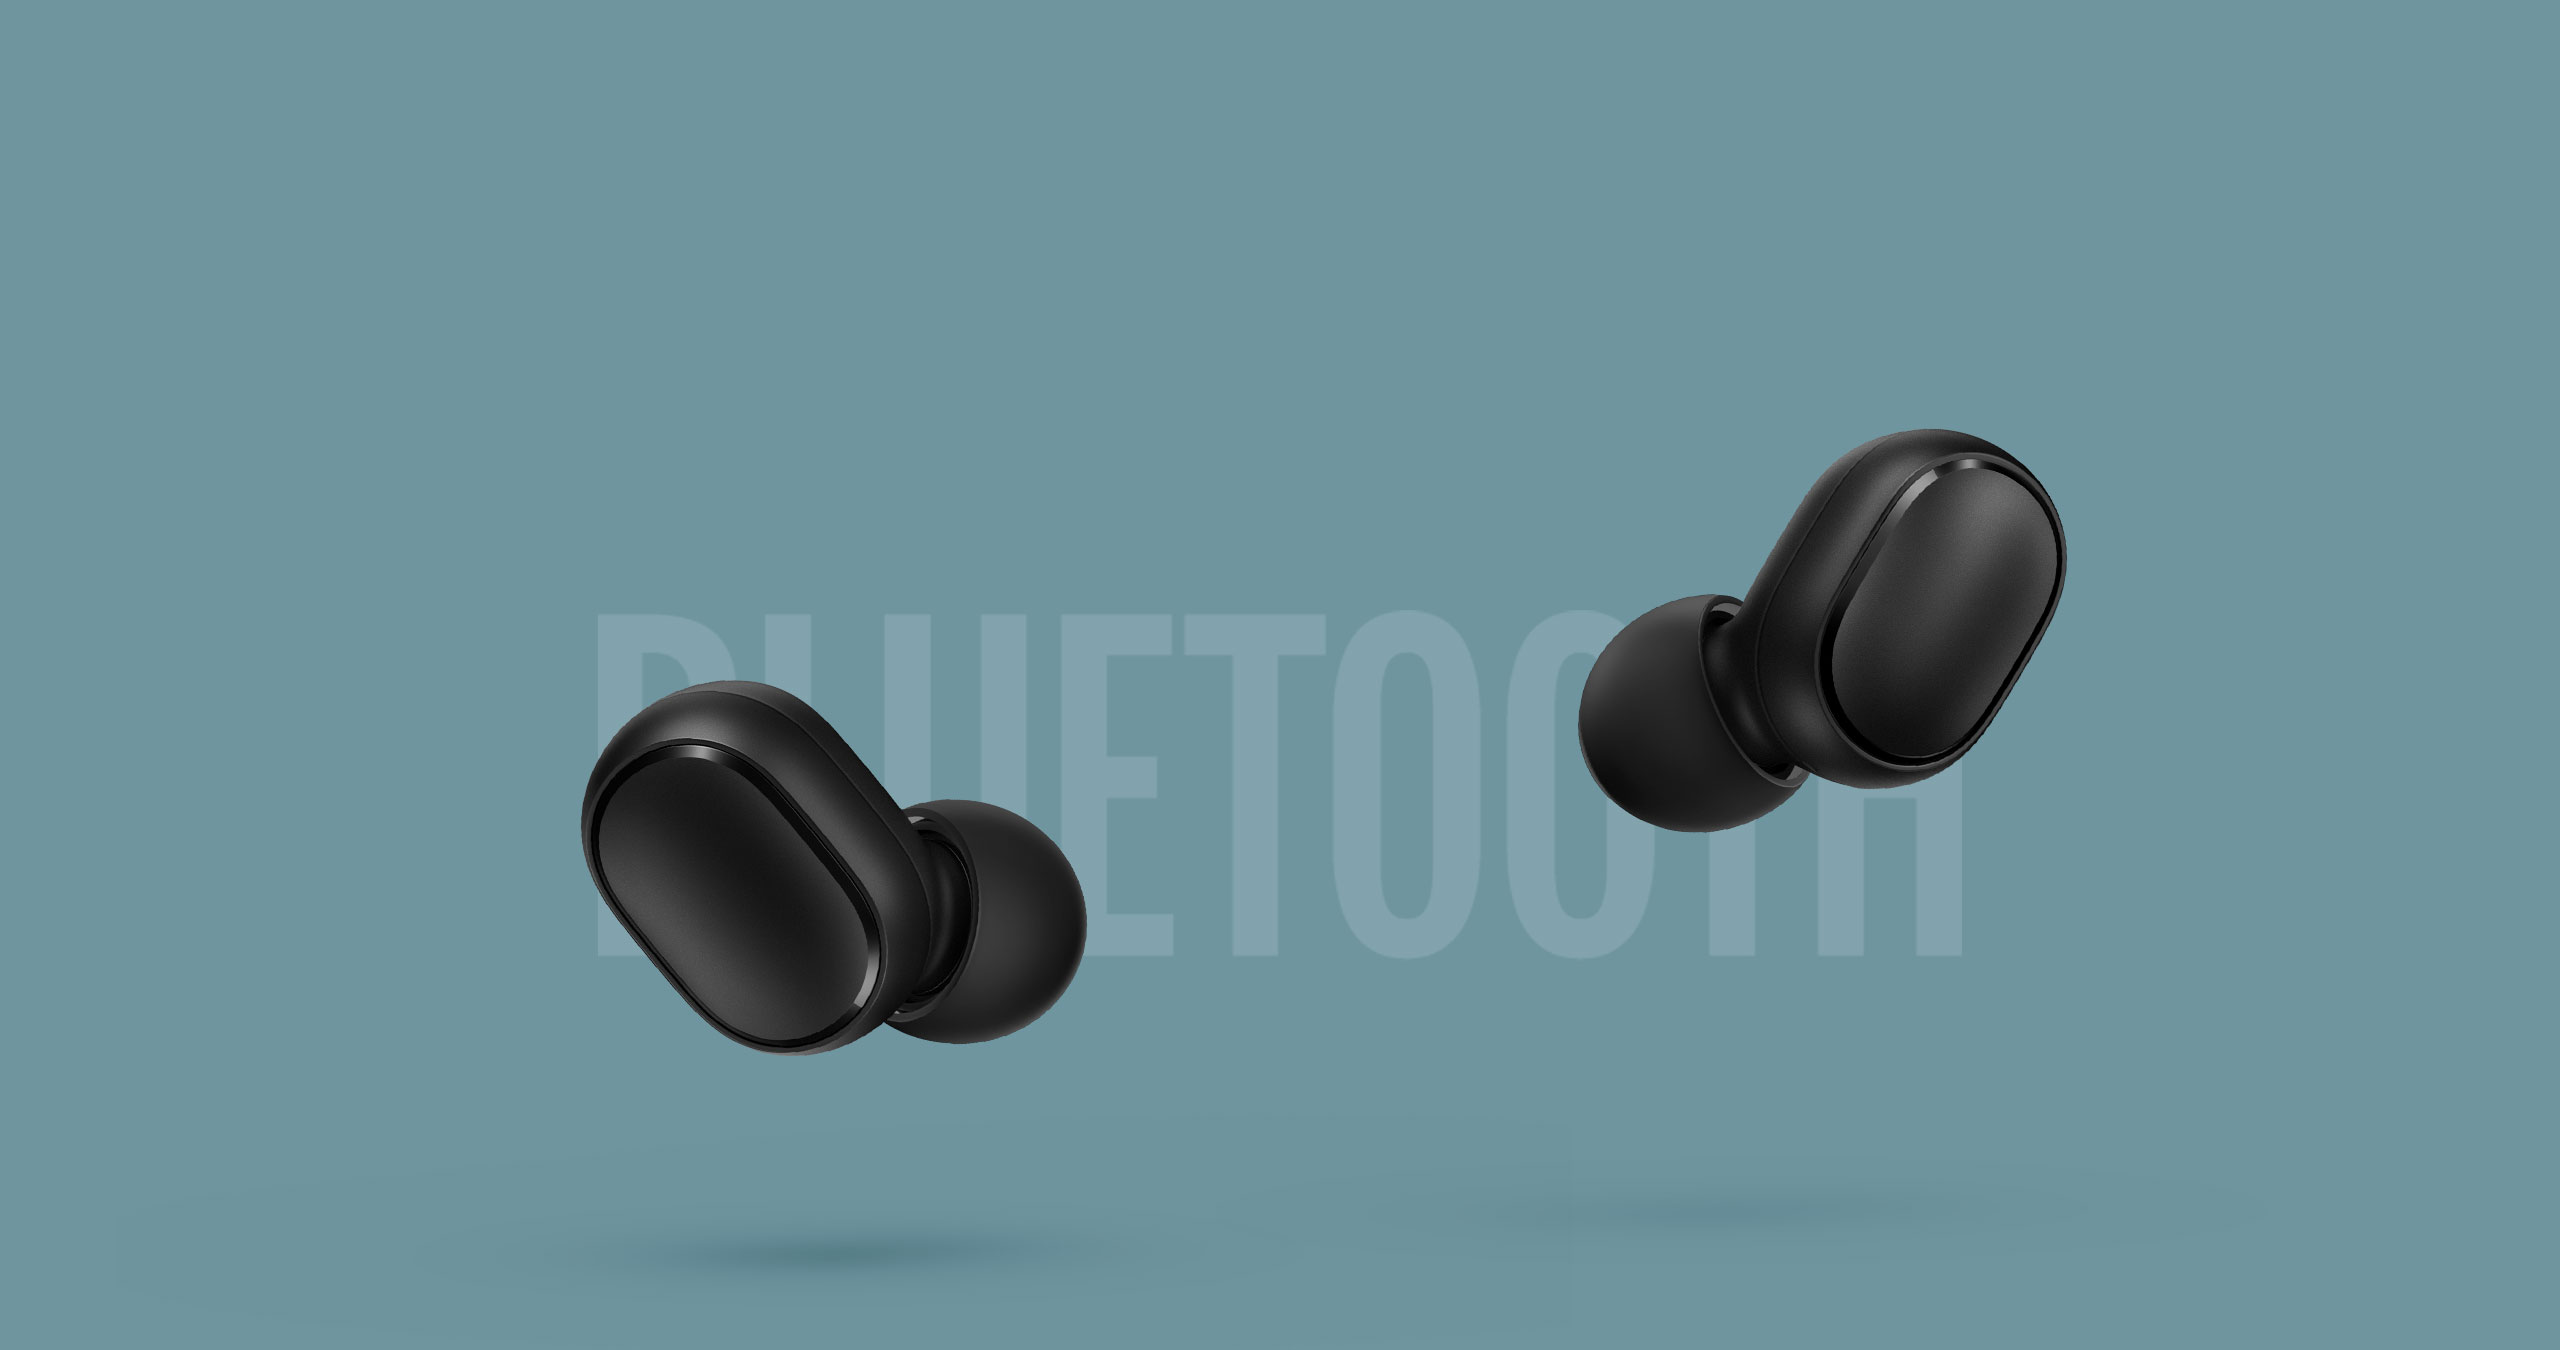 小米 藍牙 耳機 airdots 超 值 版 mobile01